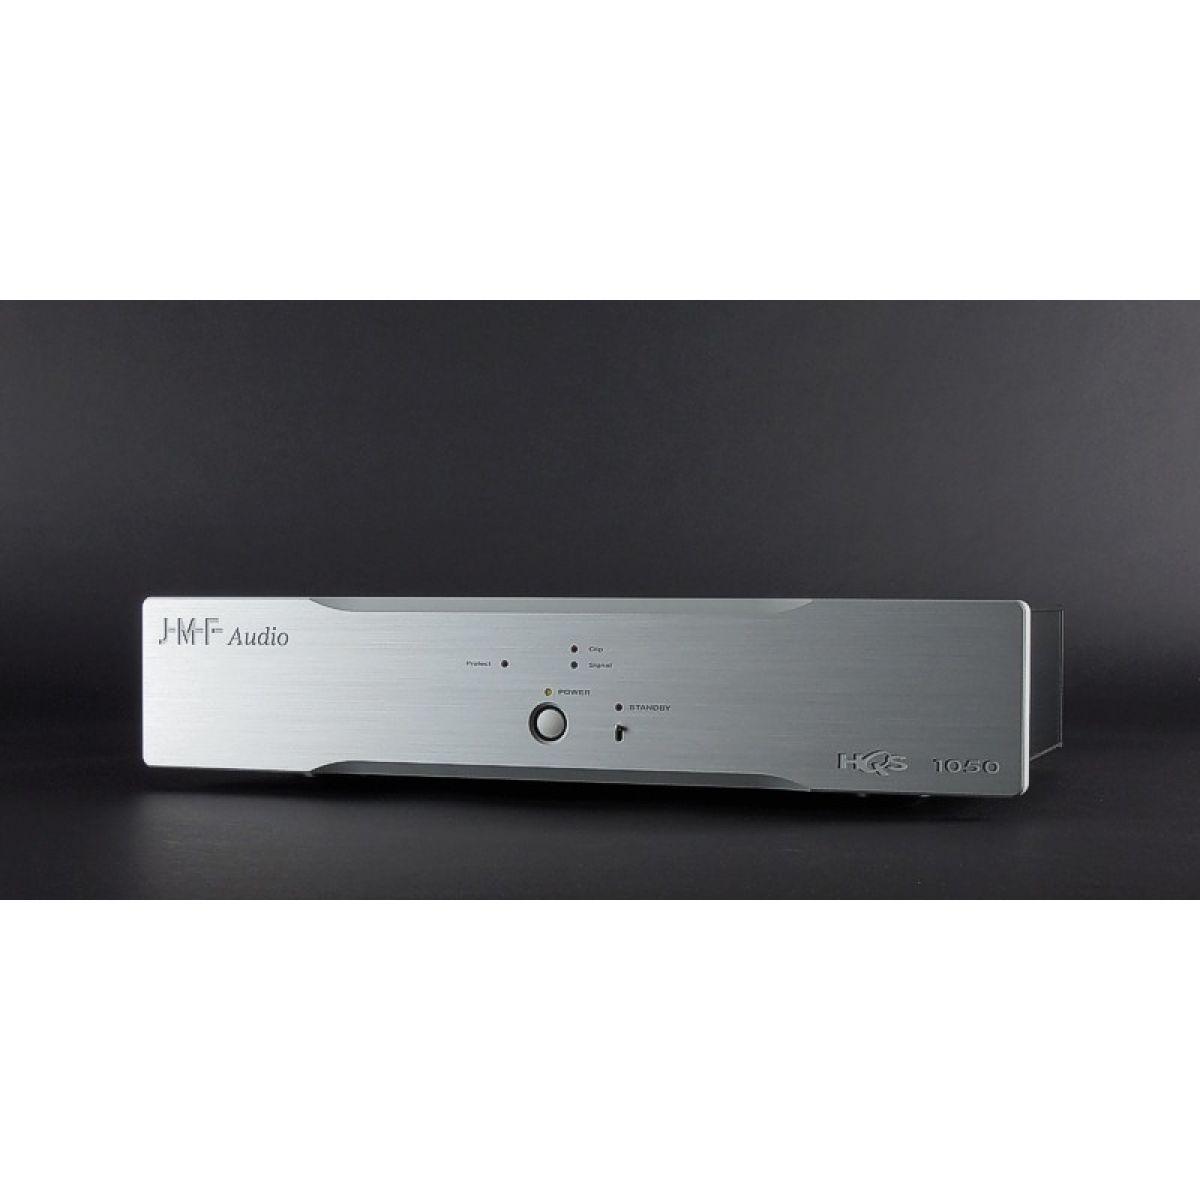 JMF Audio HQS1050